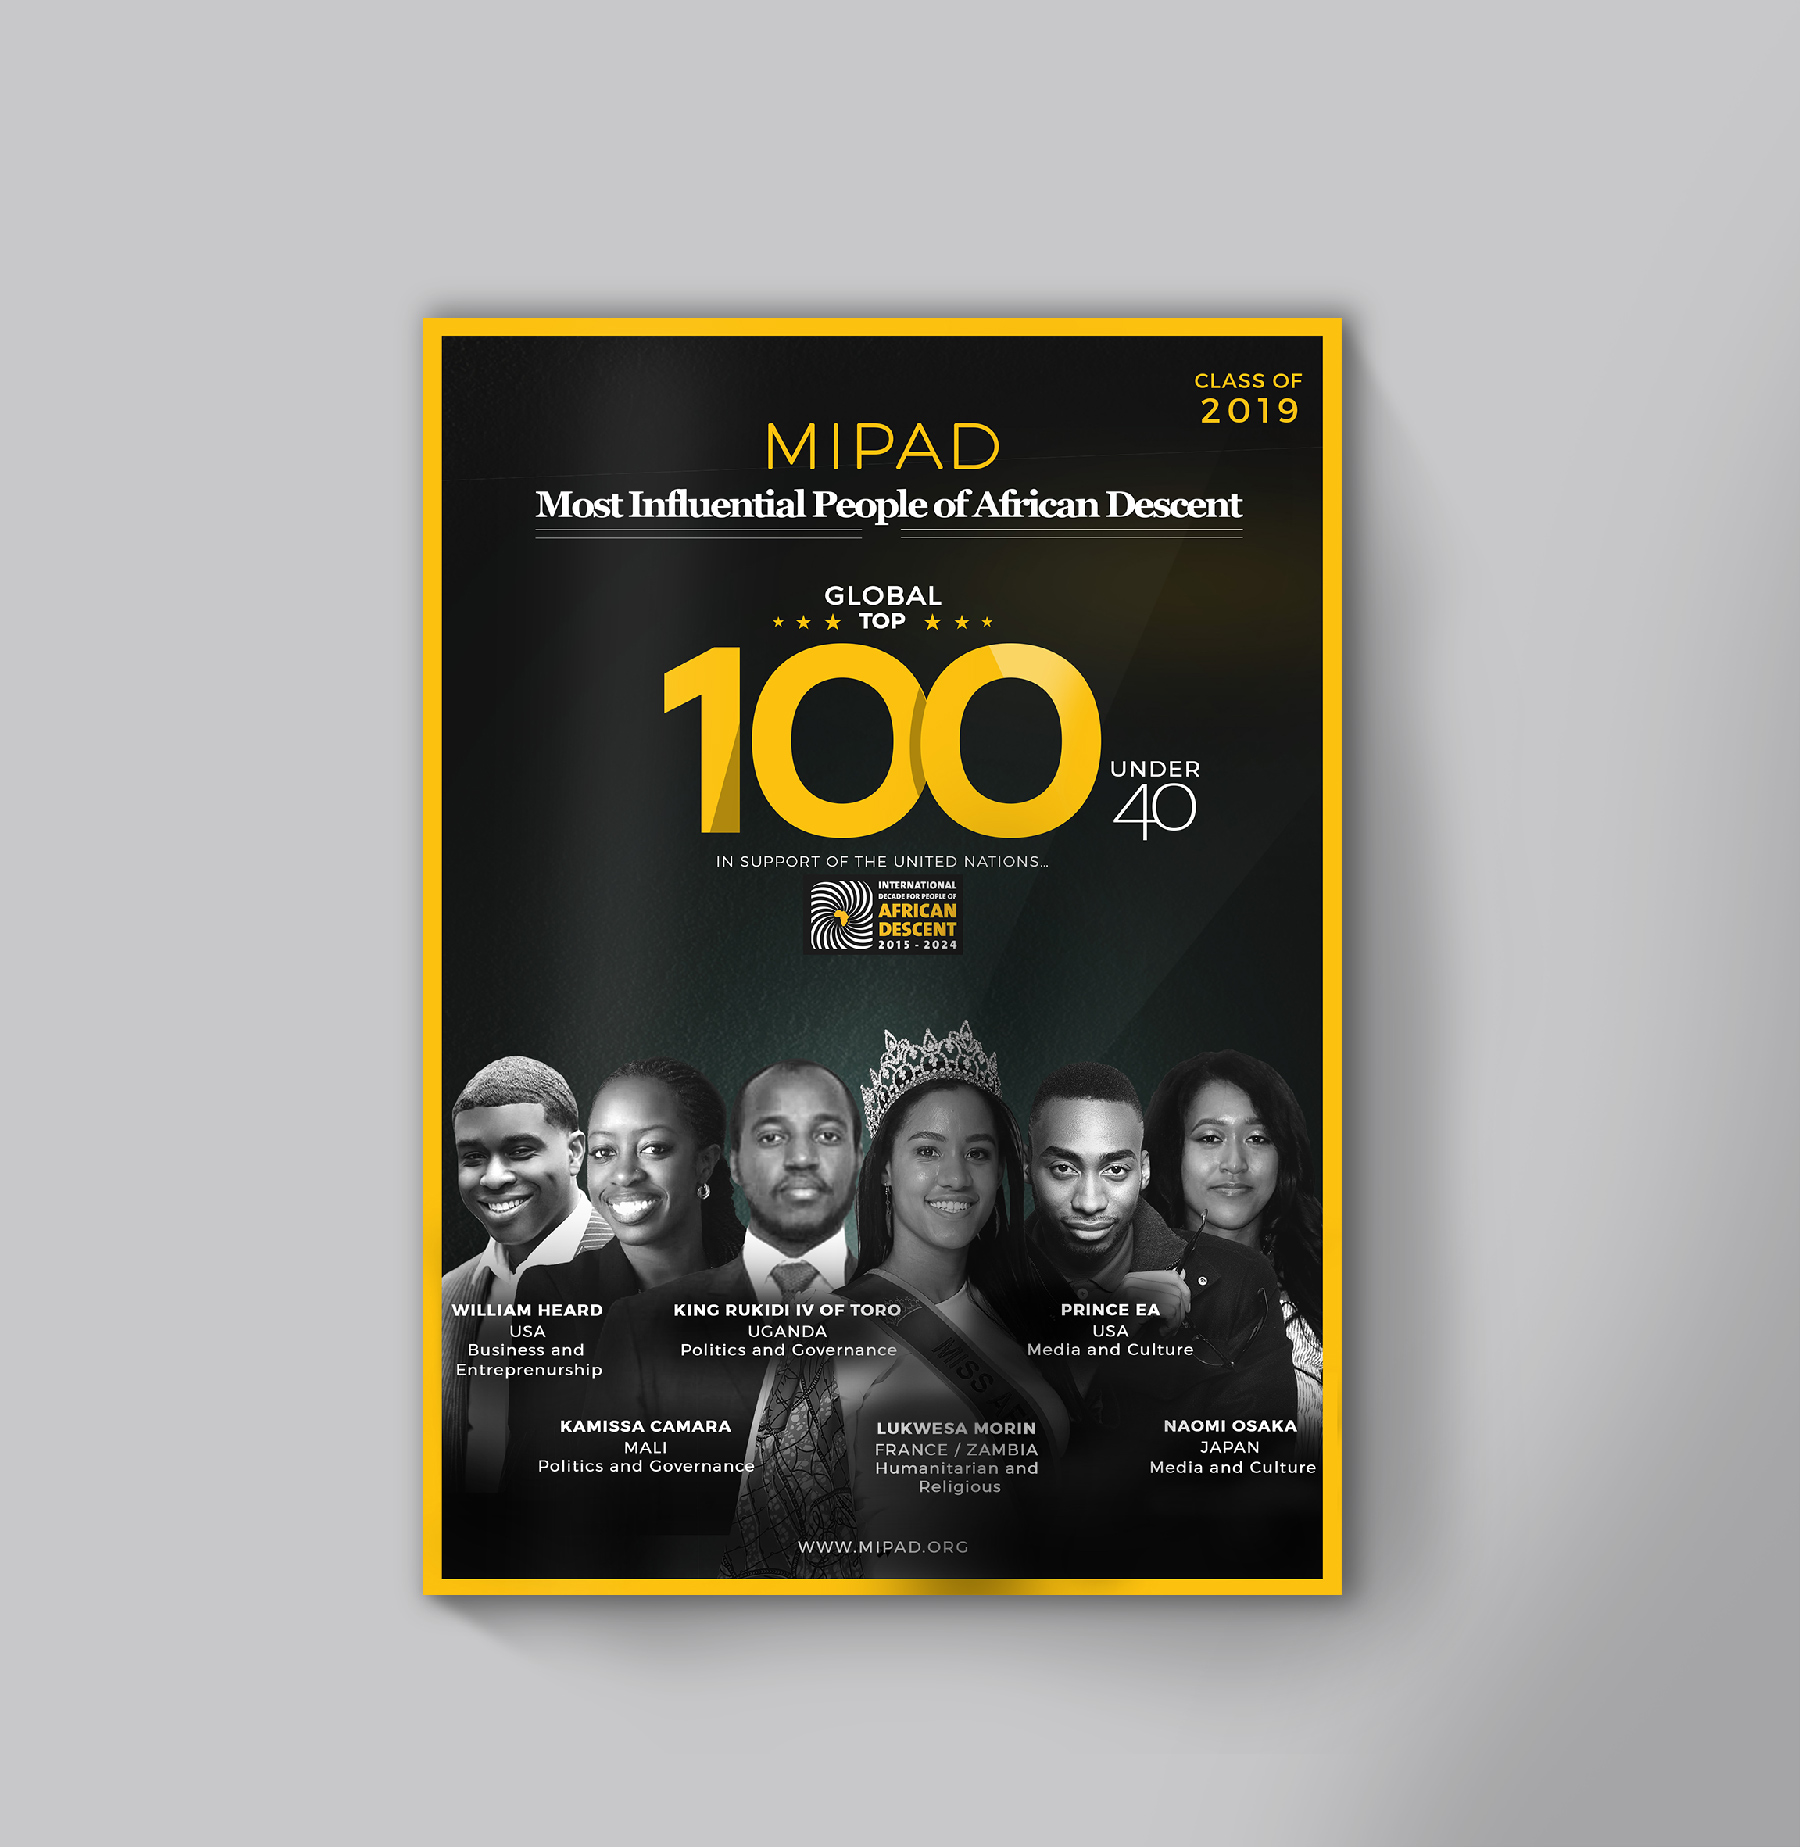 MIPAD-2019-COVER